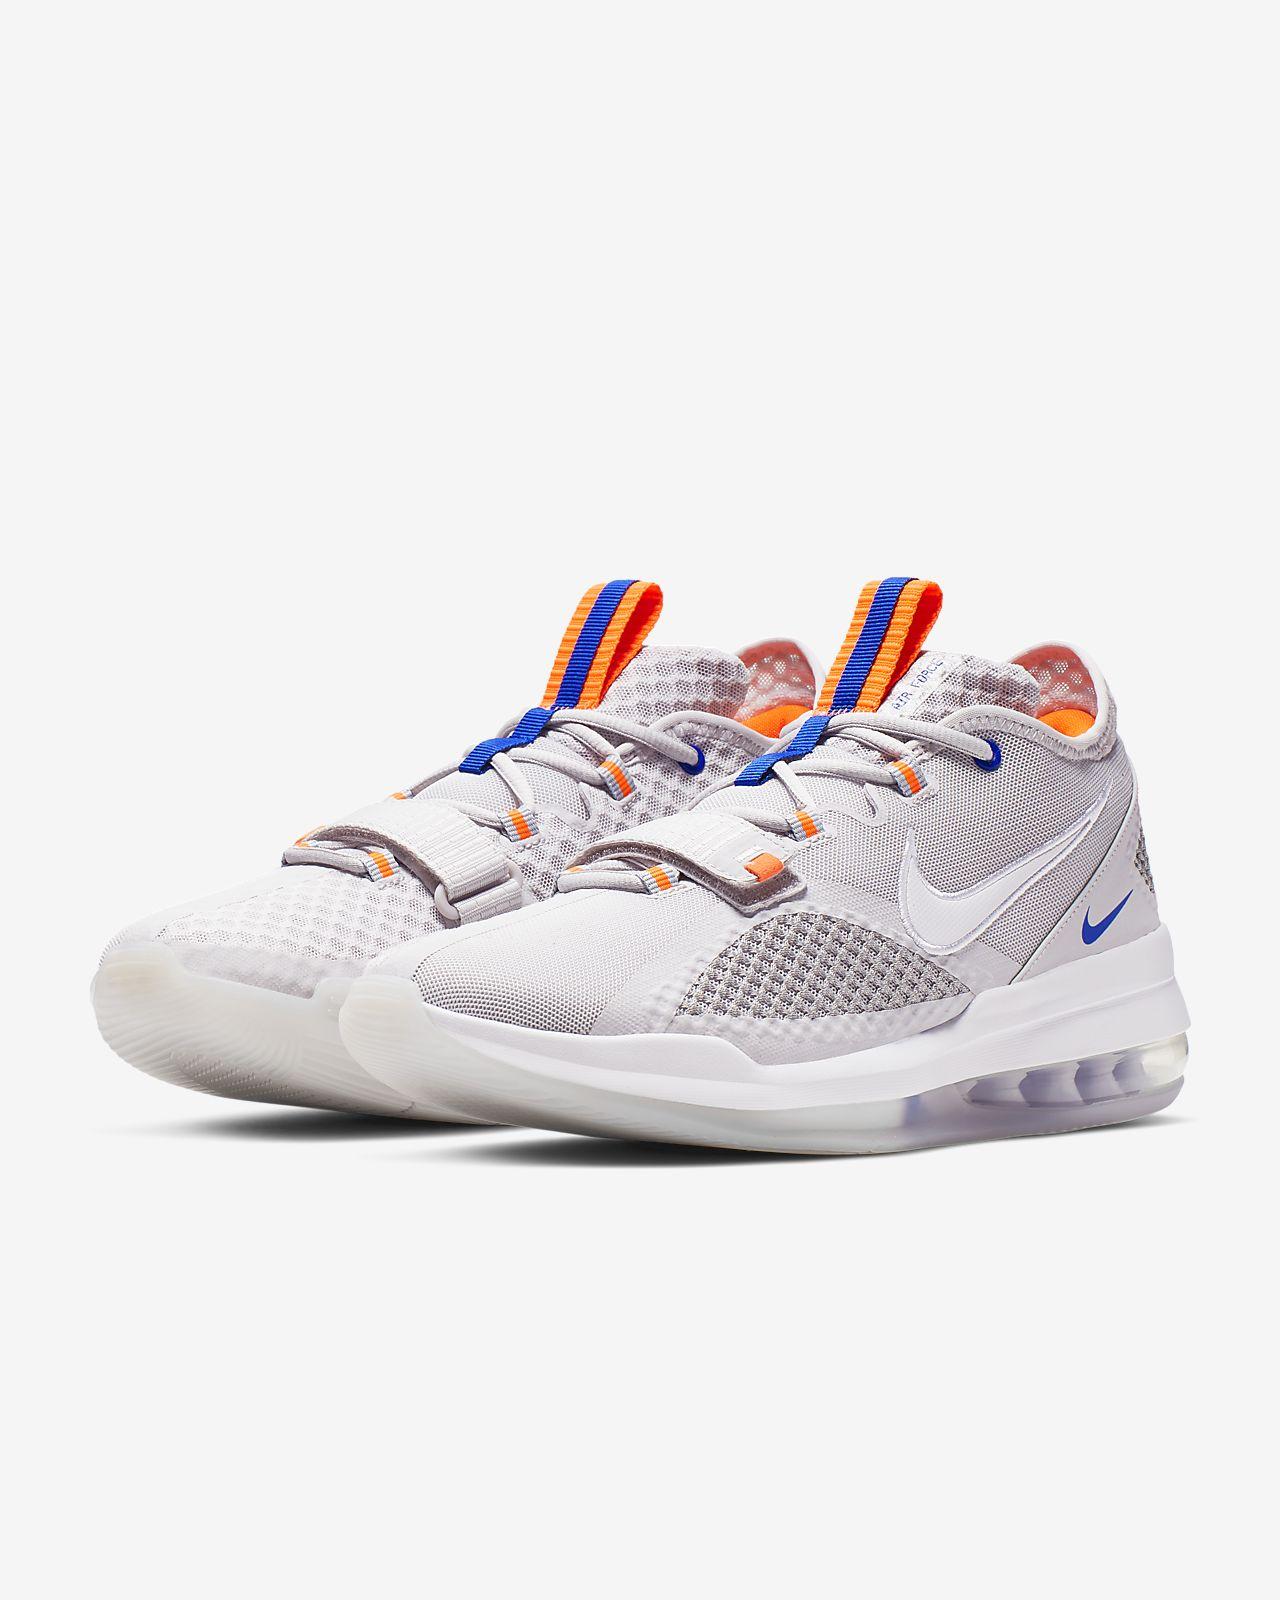 Basket Air Nike Da Force Low 8ok0pnw Scarpa Max BrdxQCeEoW